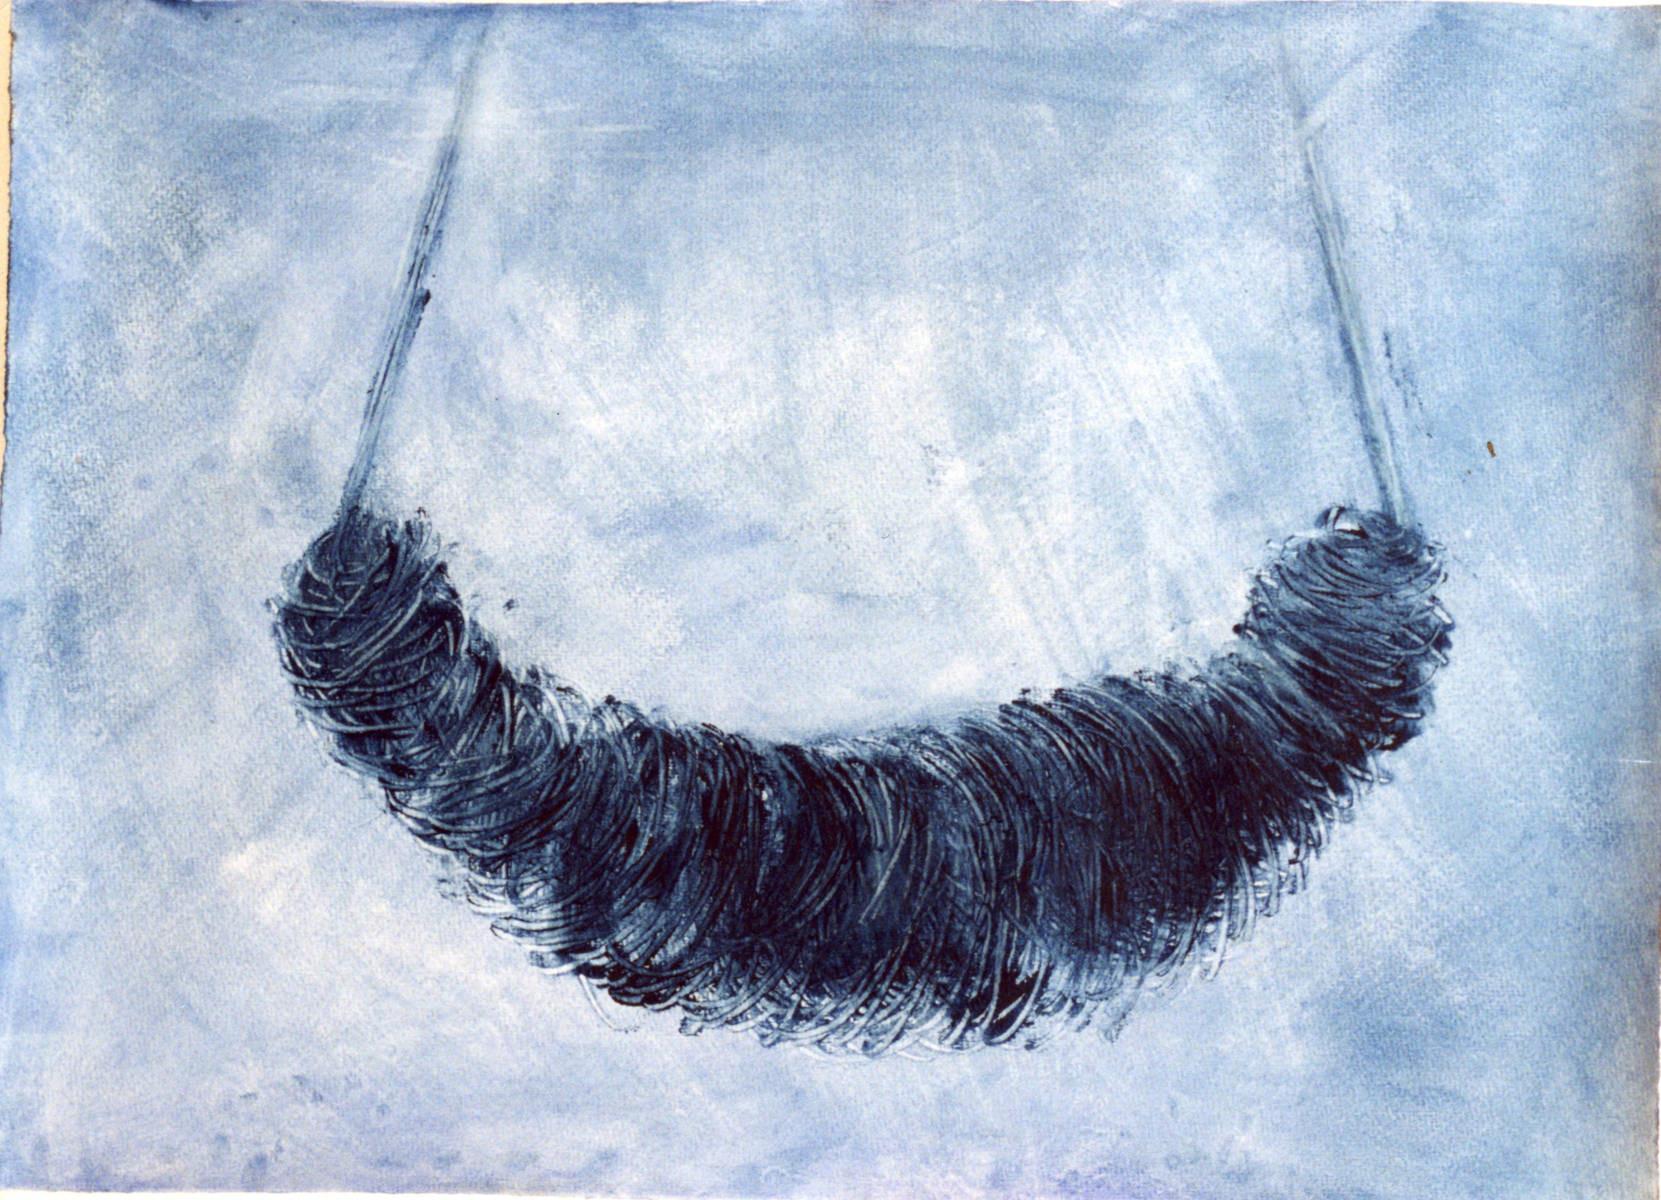 Mumie verpuppt, 62 cm x 42 cm, Gouache auf Papier, 1997